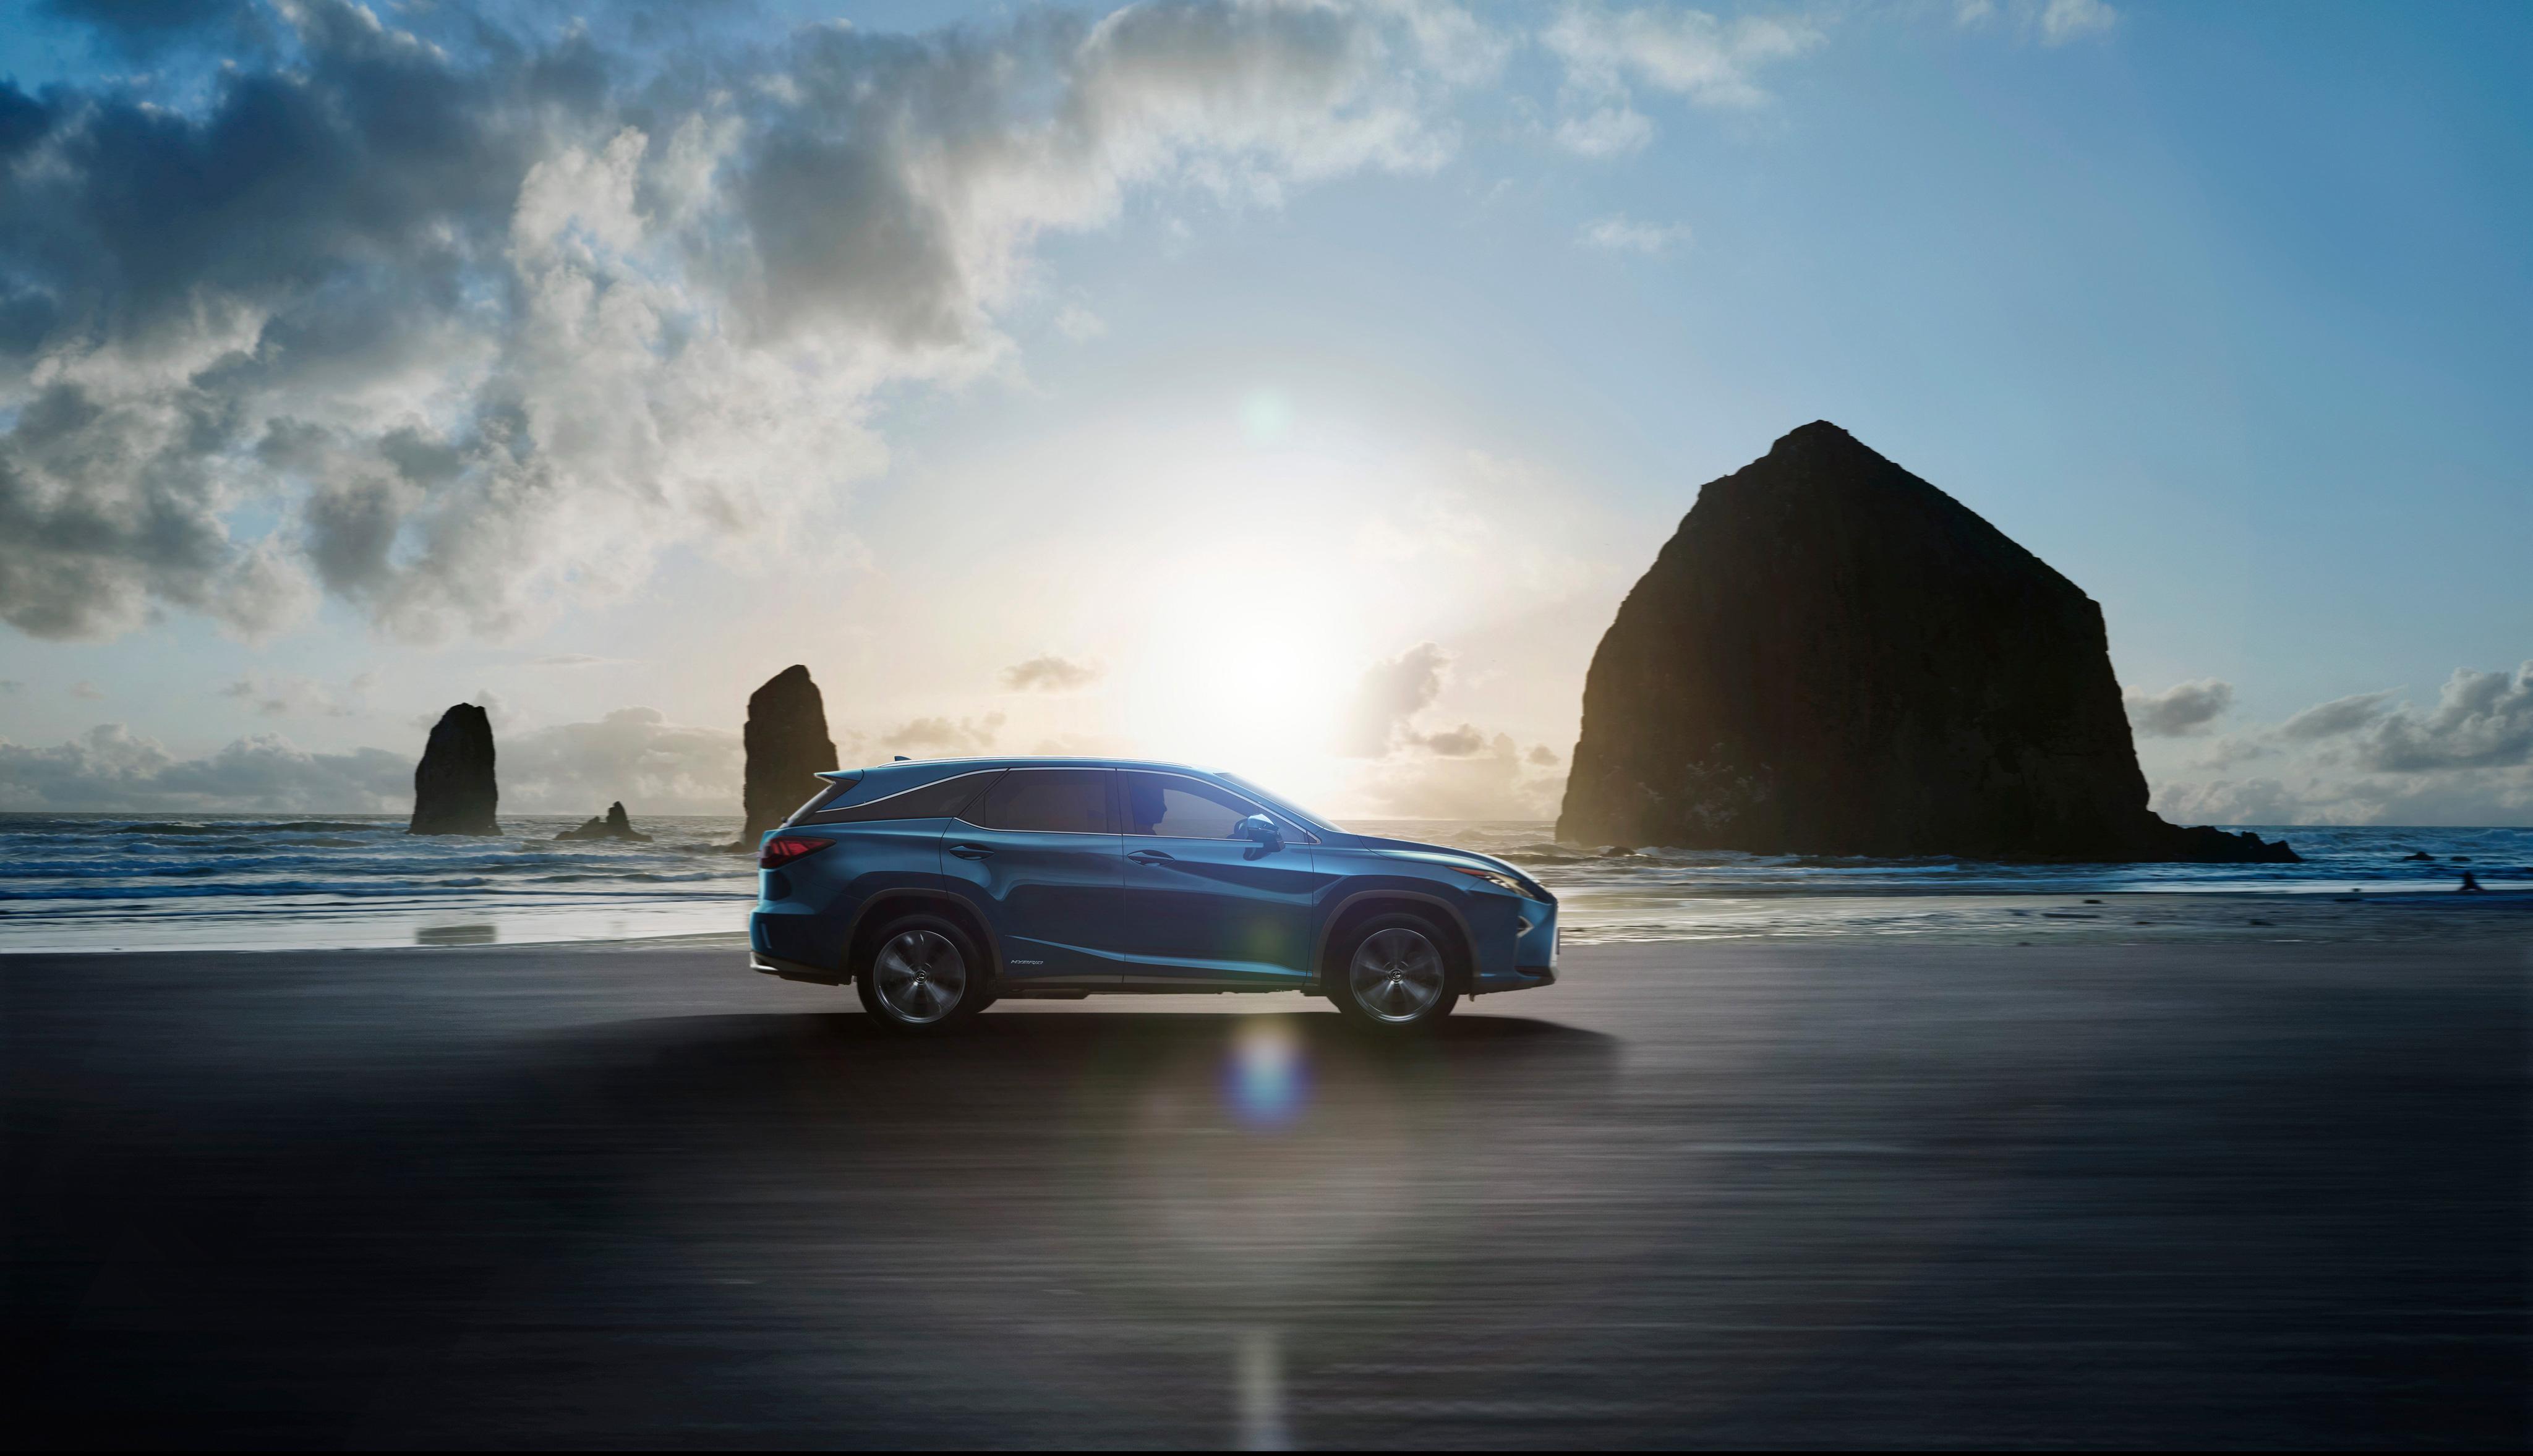 2018 Lexus RX 450hL, HD Cars, 4k Wallpapers, Images